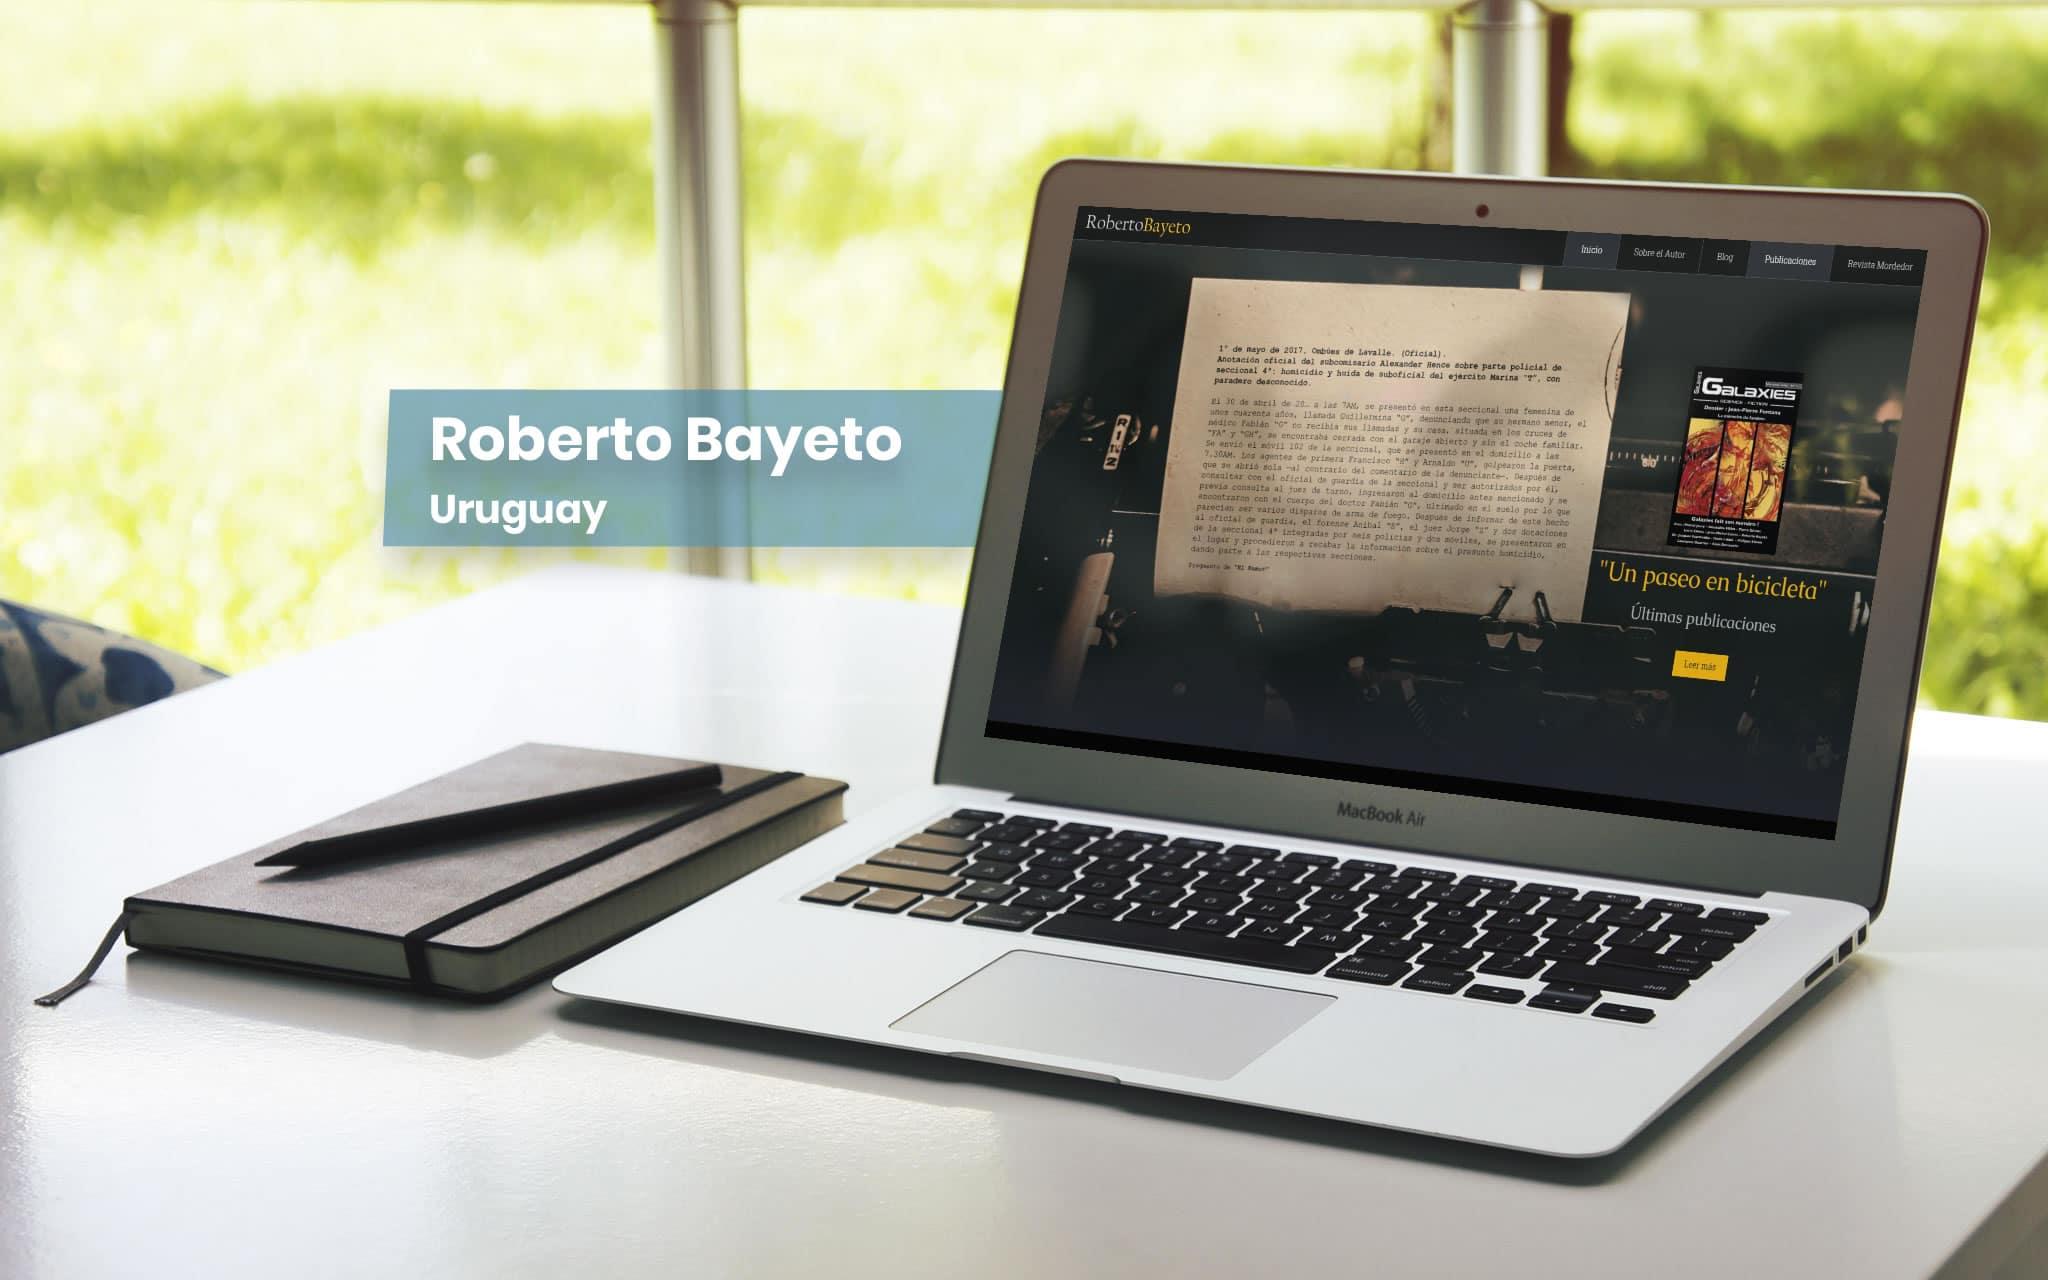 Roberto Bayeto - Uruguay